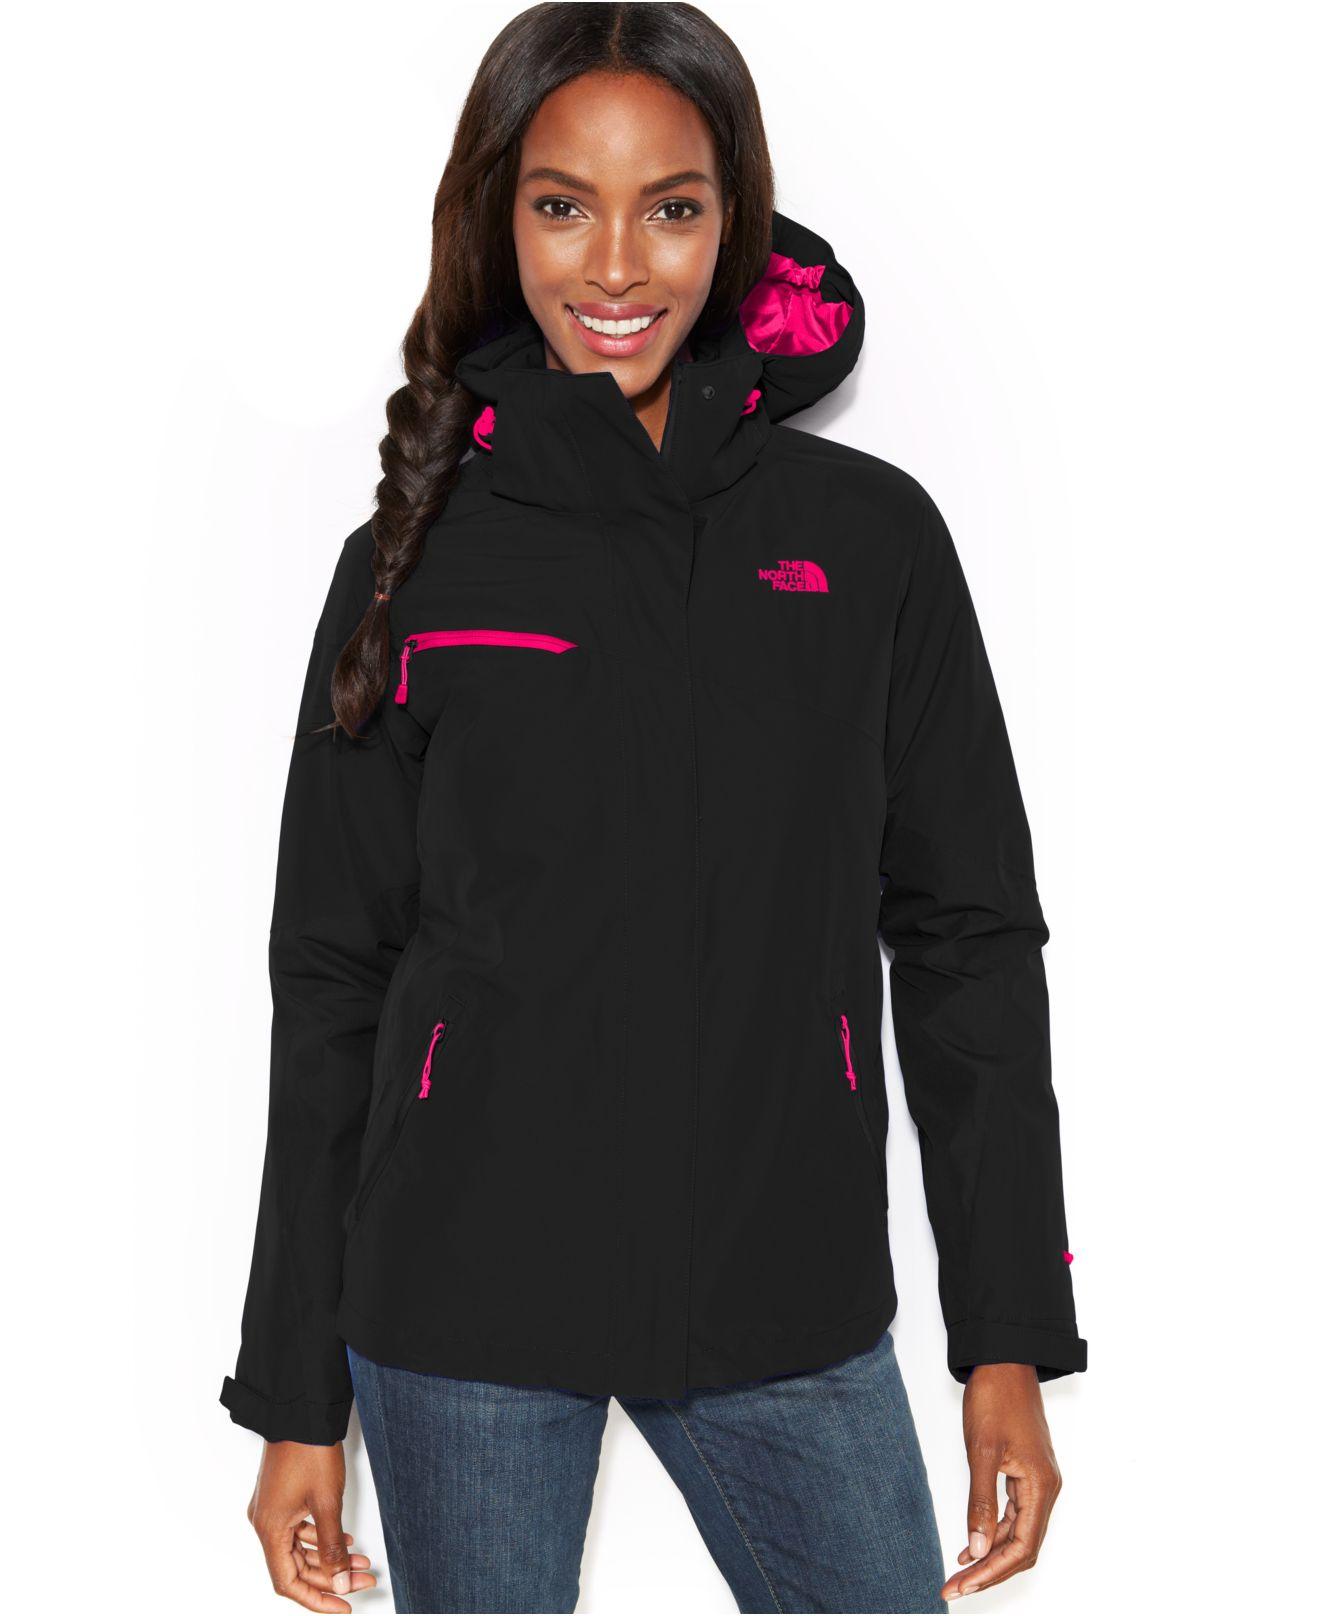 c6246ee21 The North Face Black Hooded Cinnabar Triclimate Waterproof Zip-Up Jacket